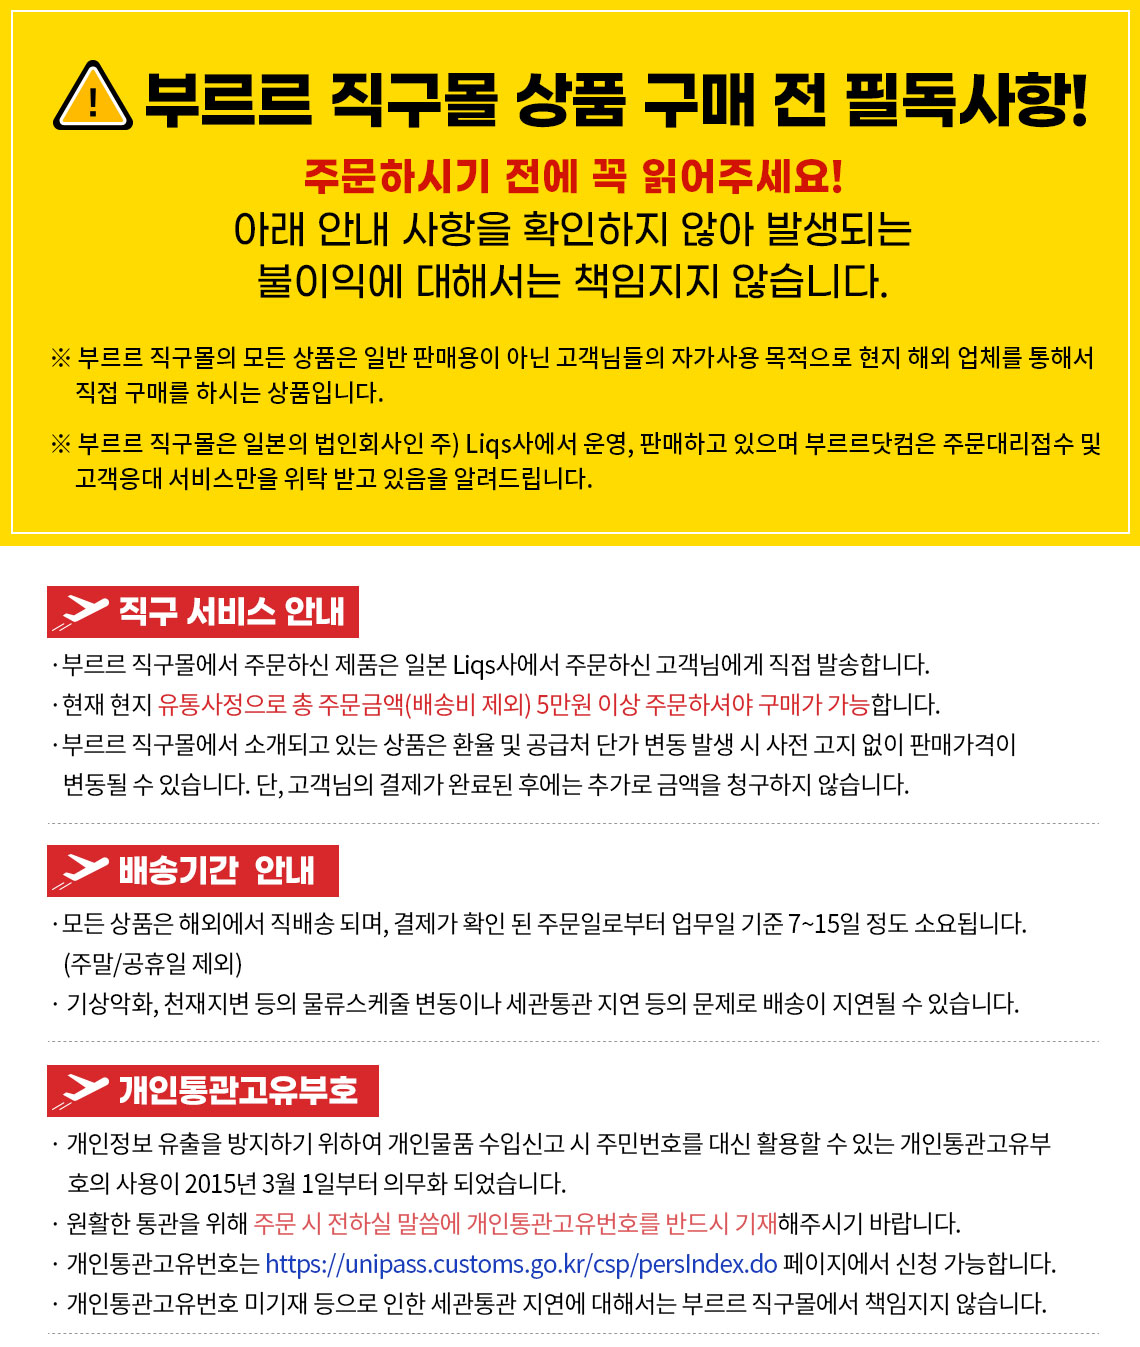 directmall_notice_01.jpg